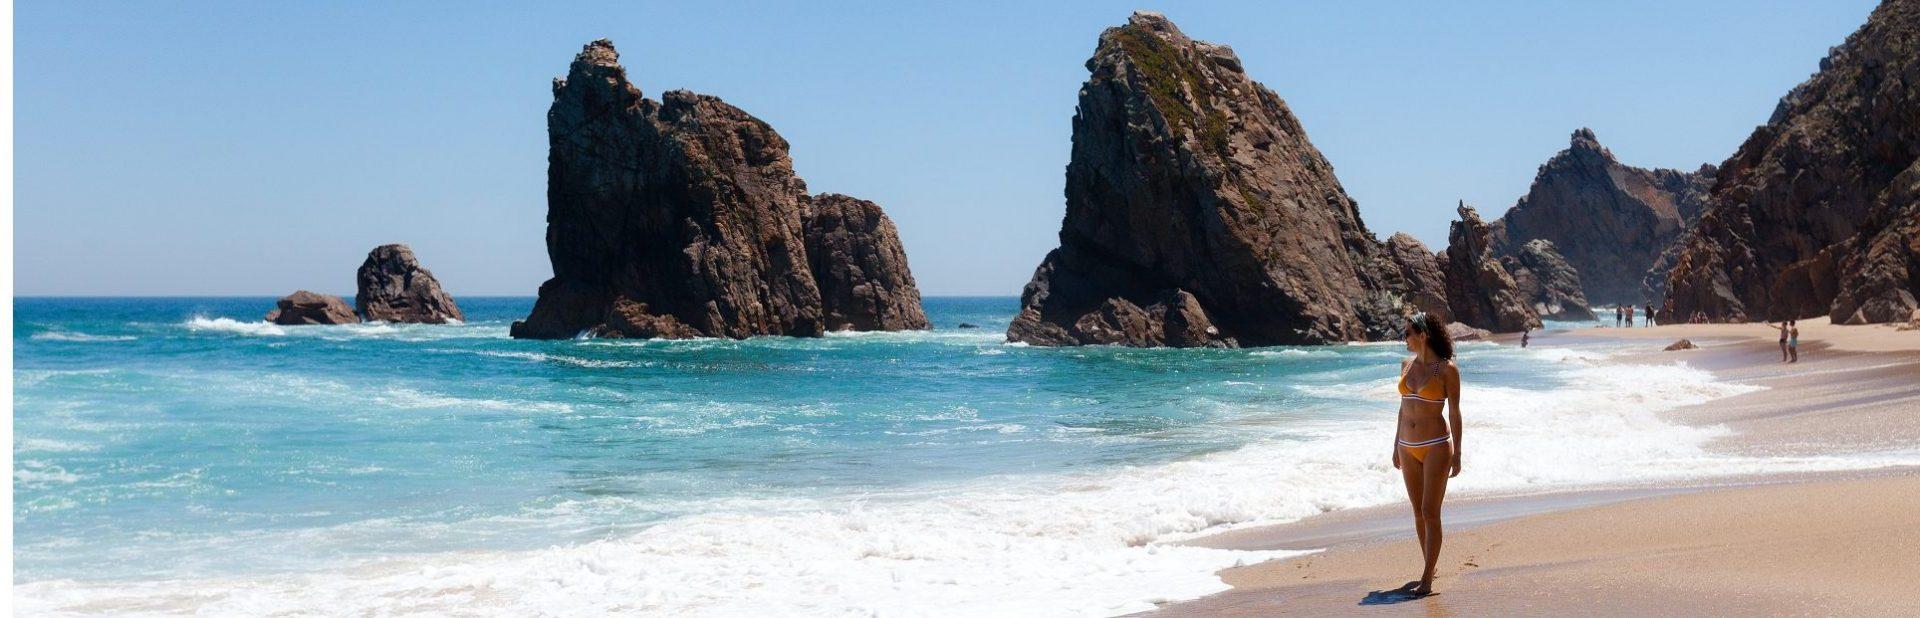 Portugal strand beste reistijd